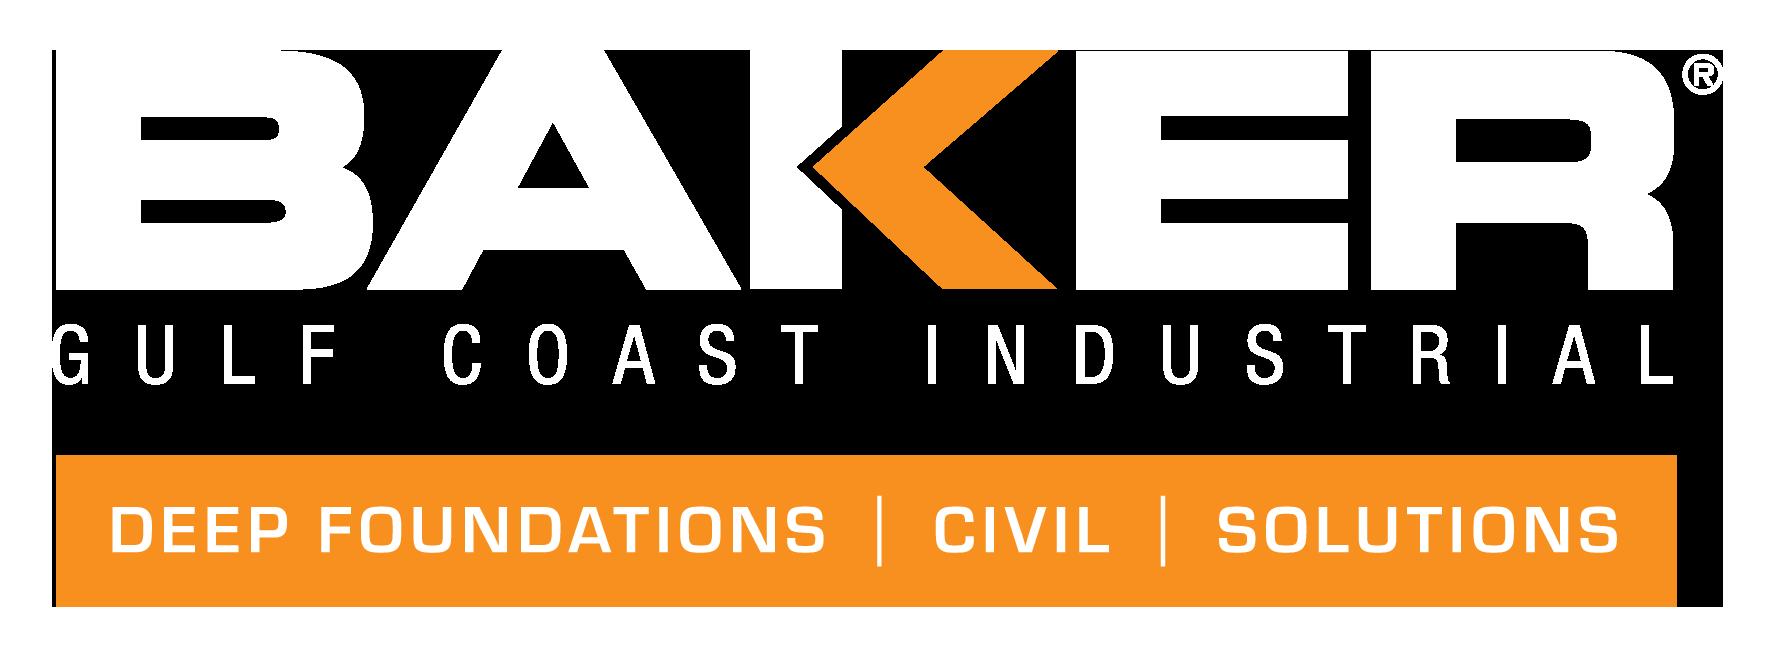 Baker Gulf Coast Industrial - Deep Foundations - Civil - Solutions